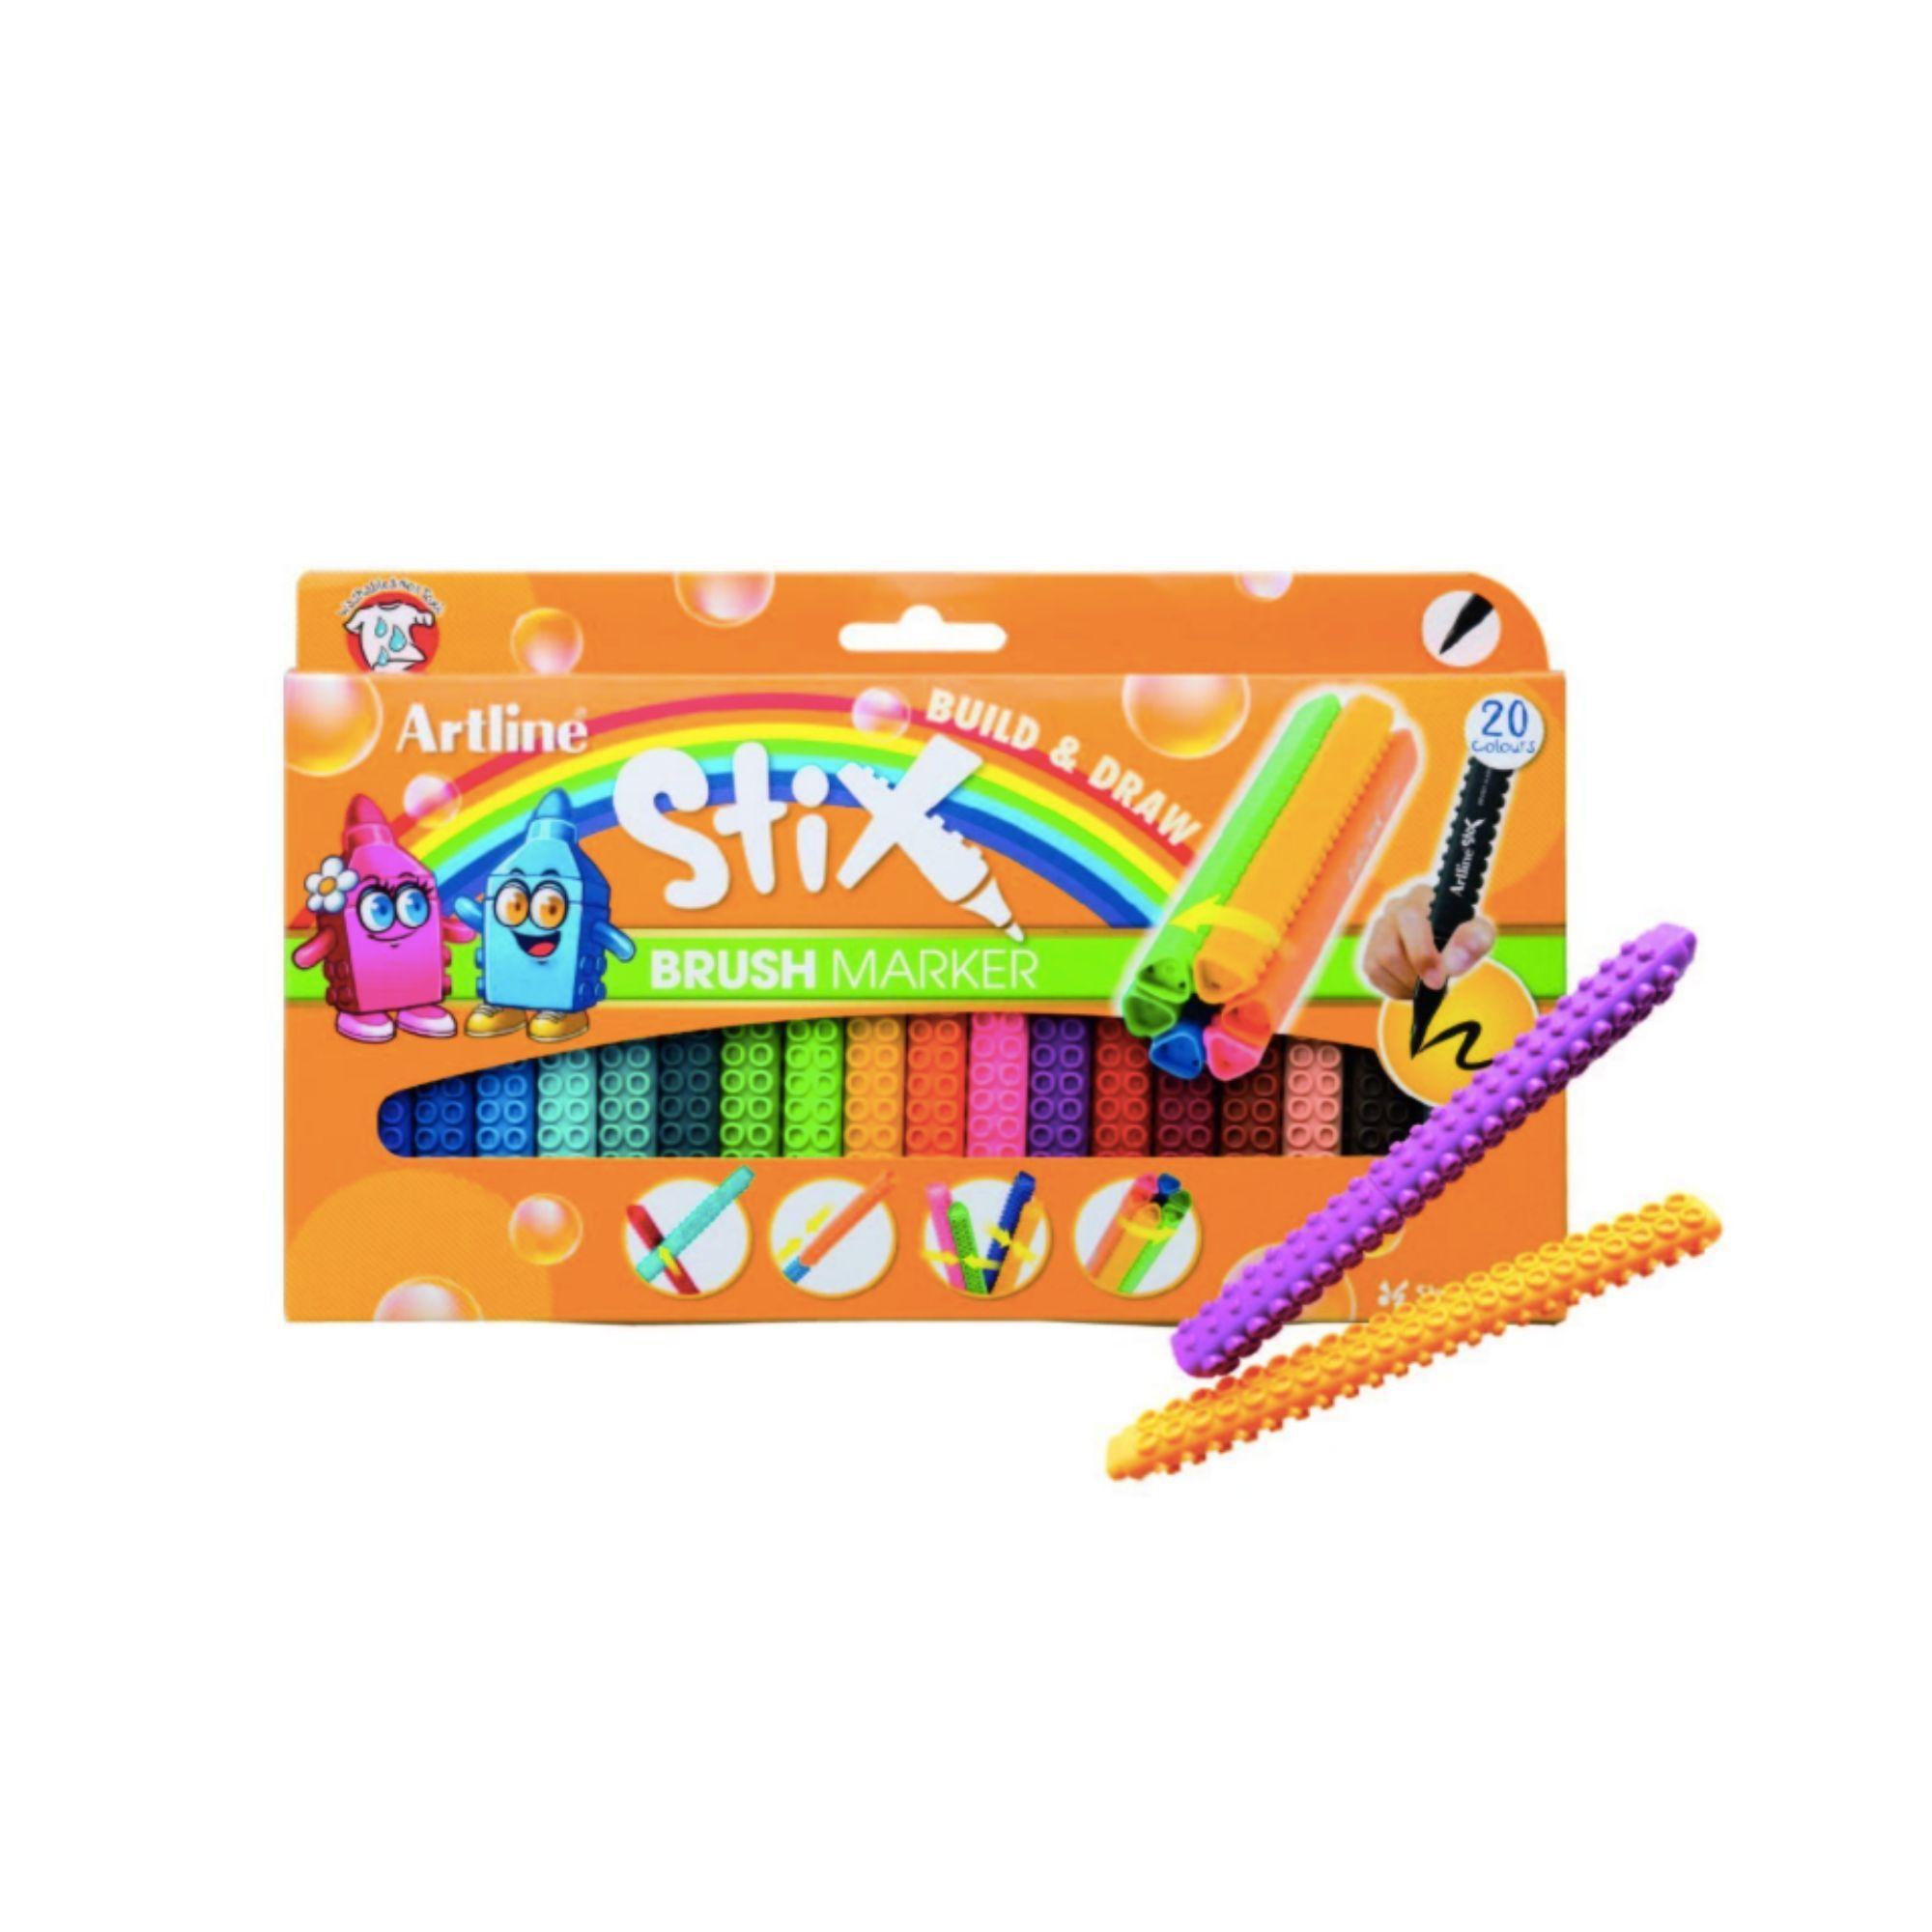 Caneta Artline Stix, Brush Marker, 20 cores